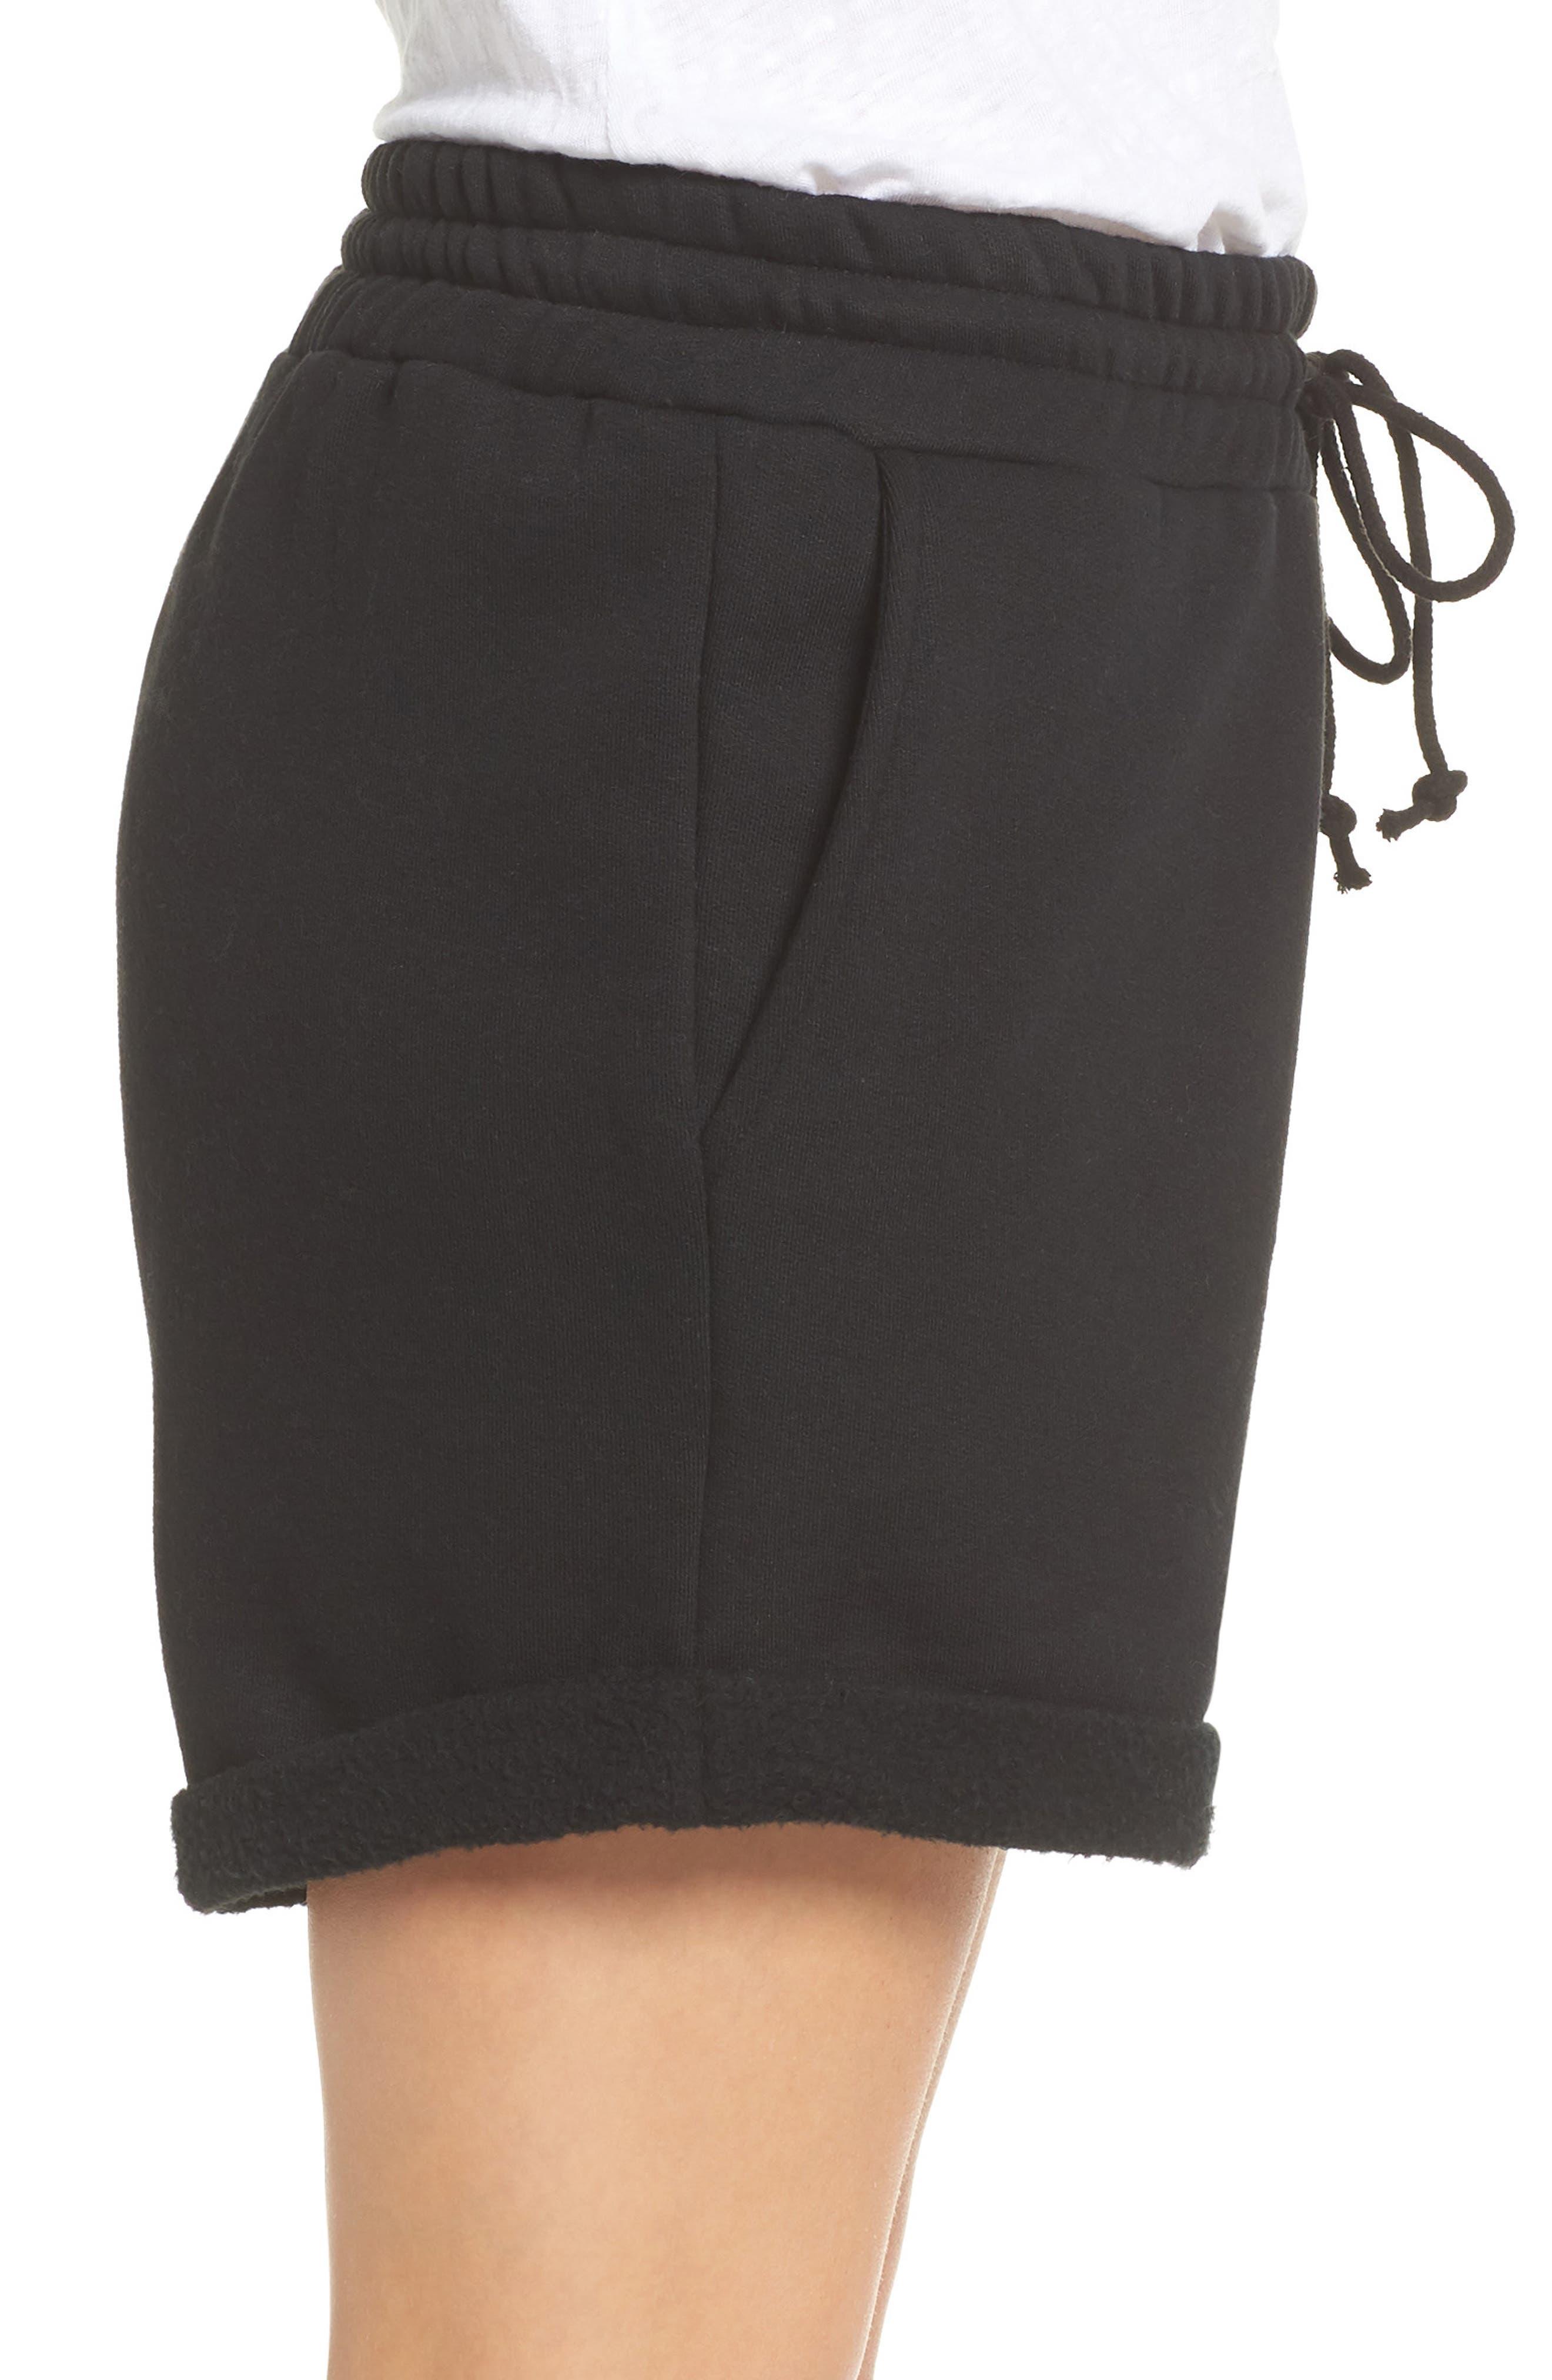 Blonde Lounge Shorts,                             Alternate thumbnail 3, color,                             Black